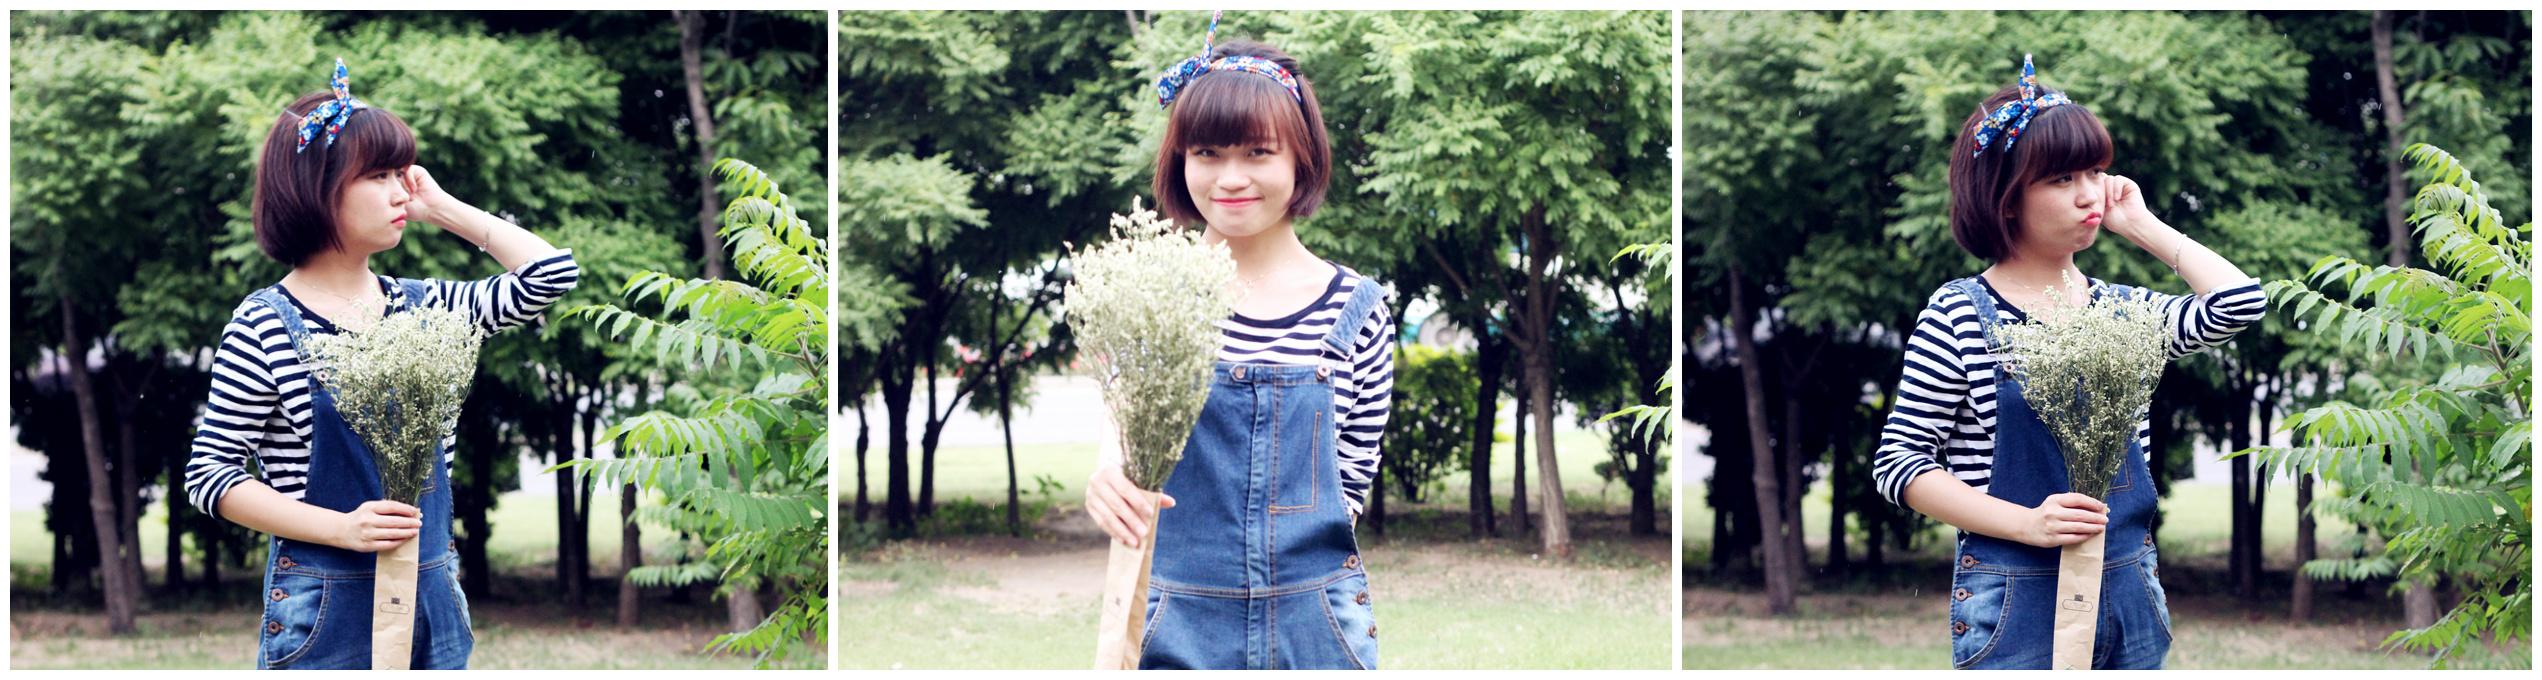 IMG_9456_副本4.jpg